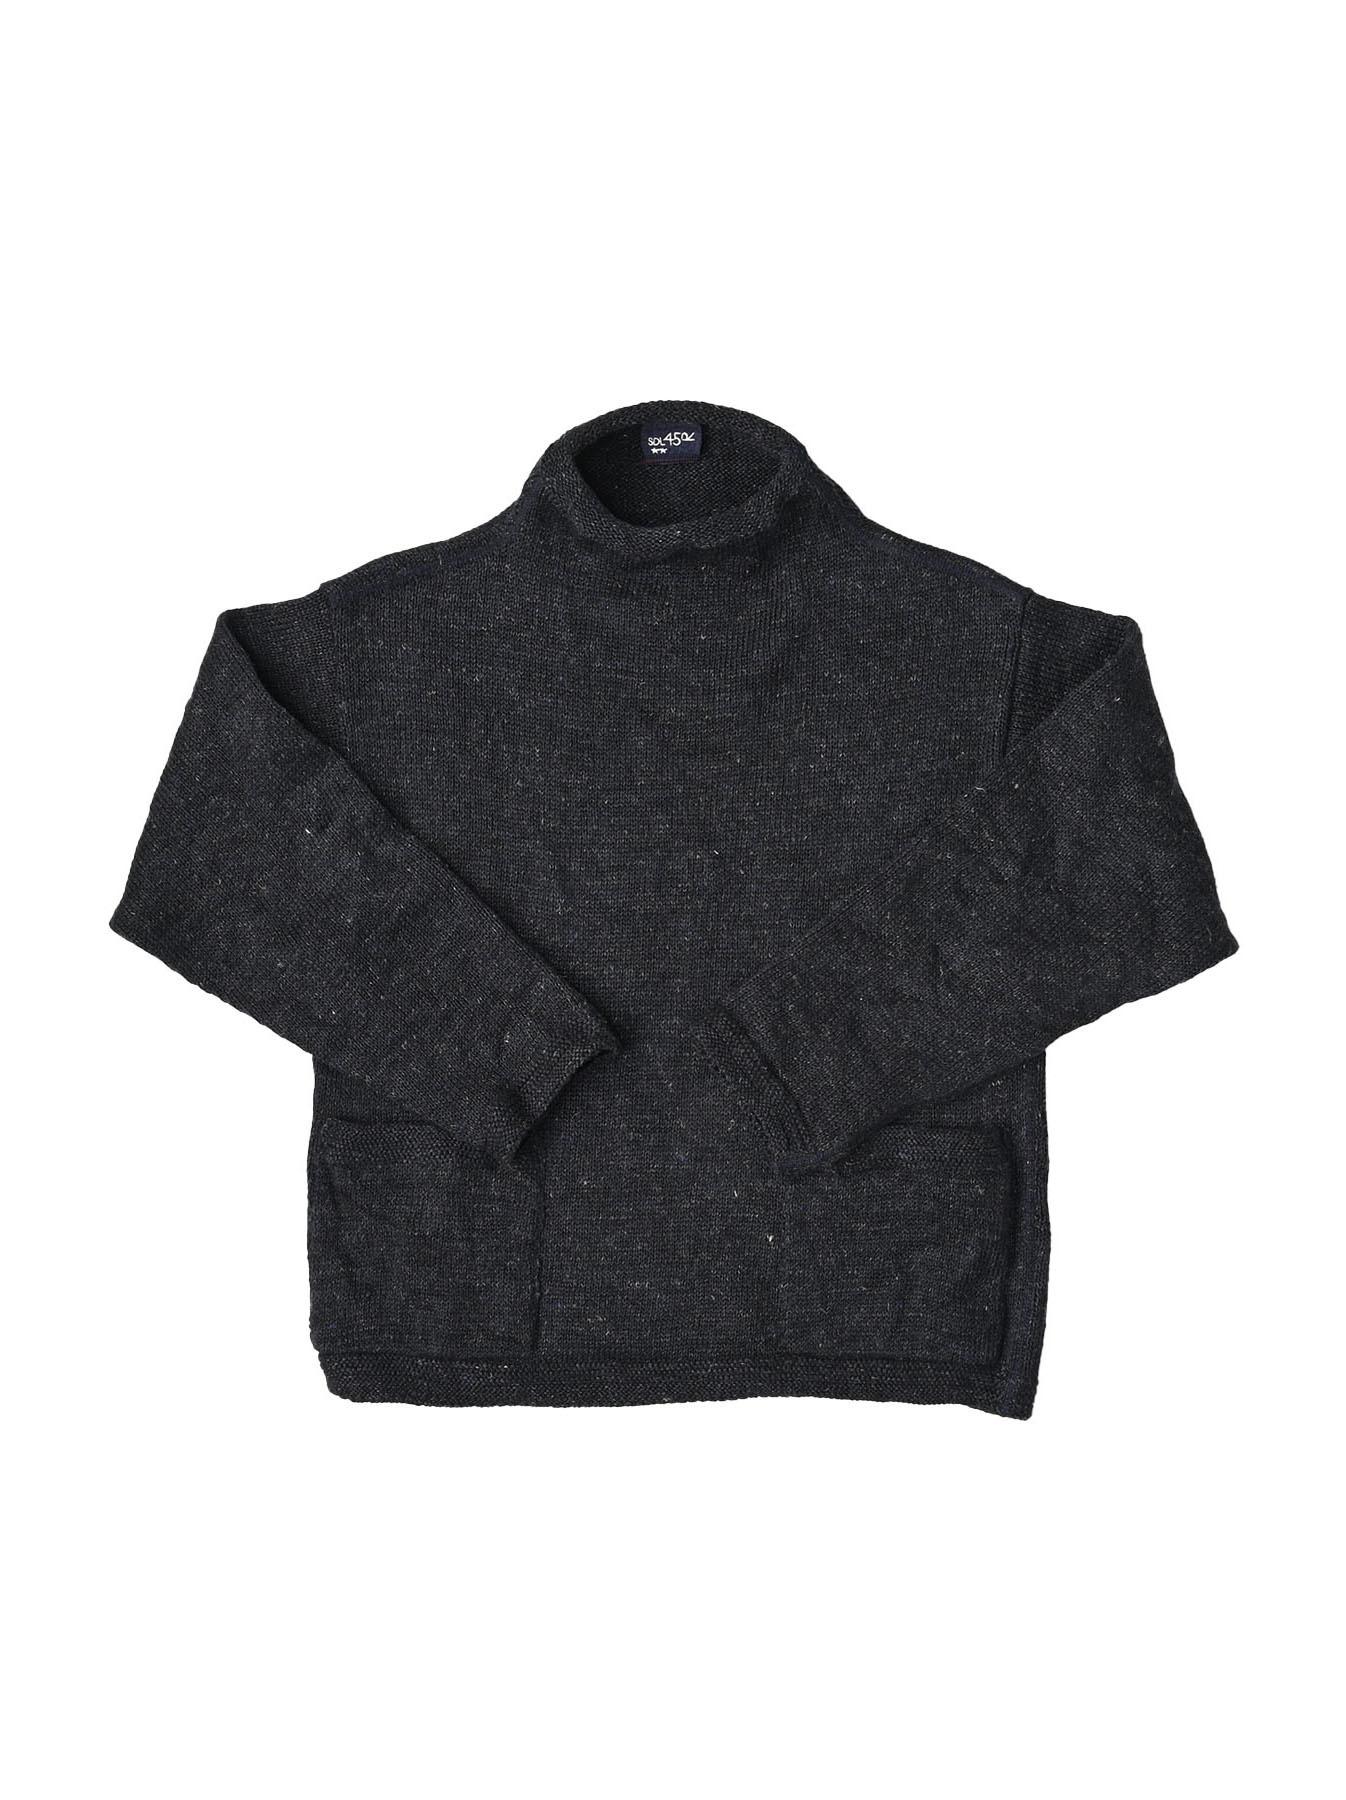 WH Linen Tweed Knit-sew 908 Umahiko Sweater (0321)-1